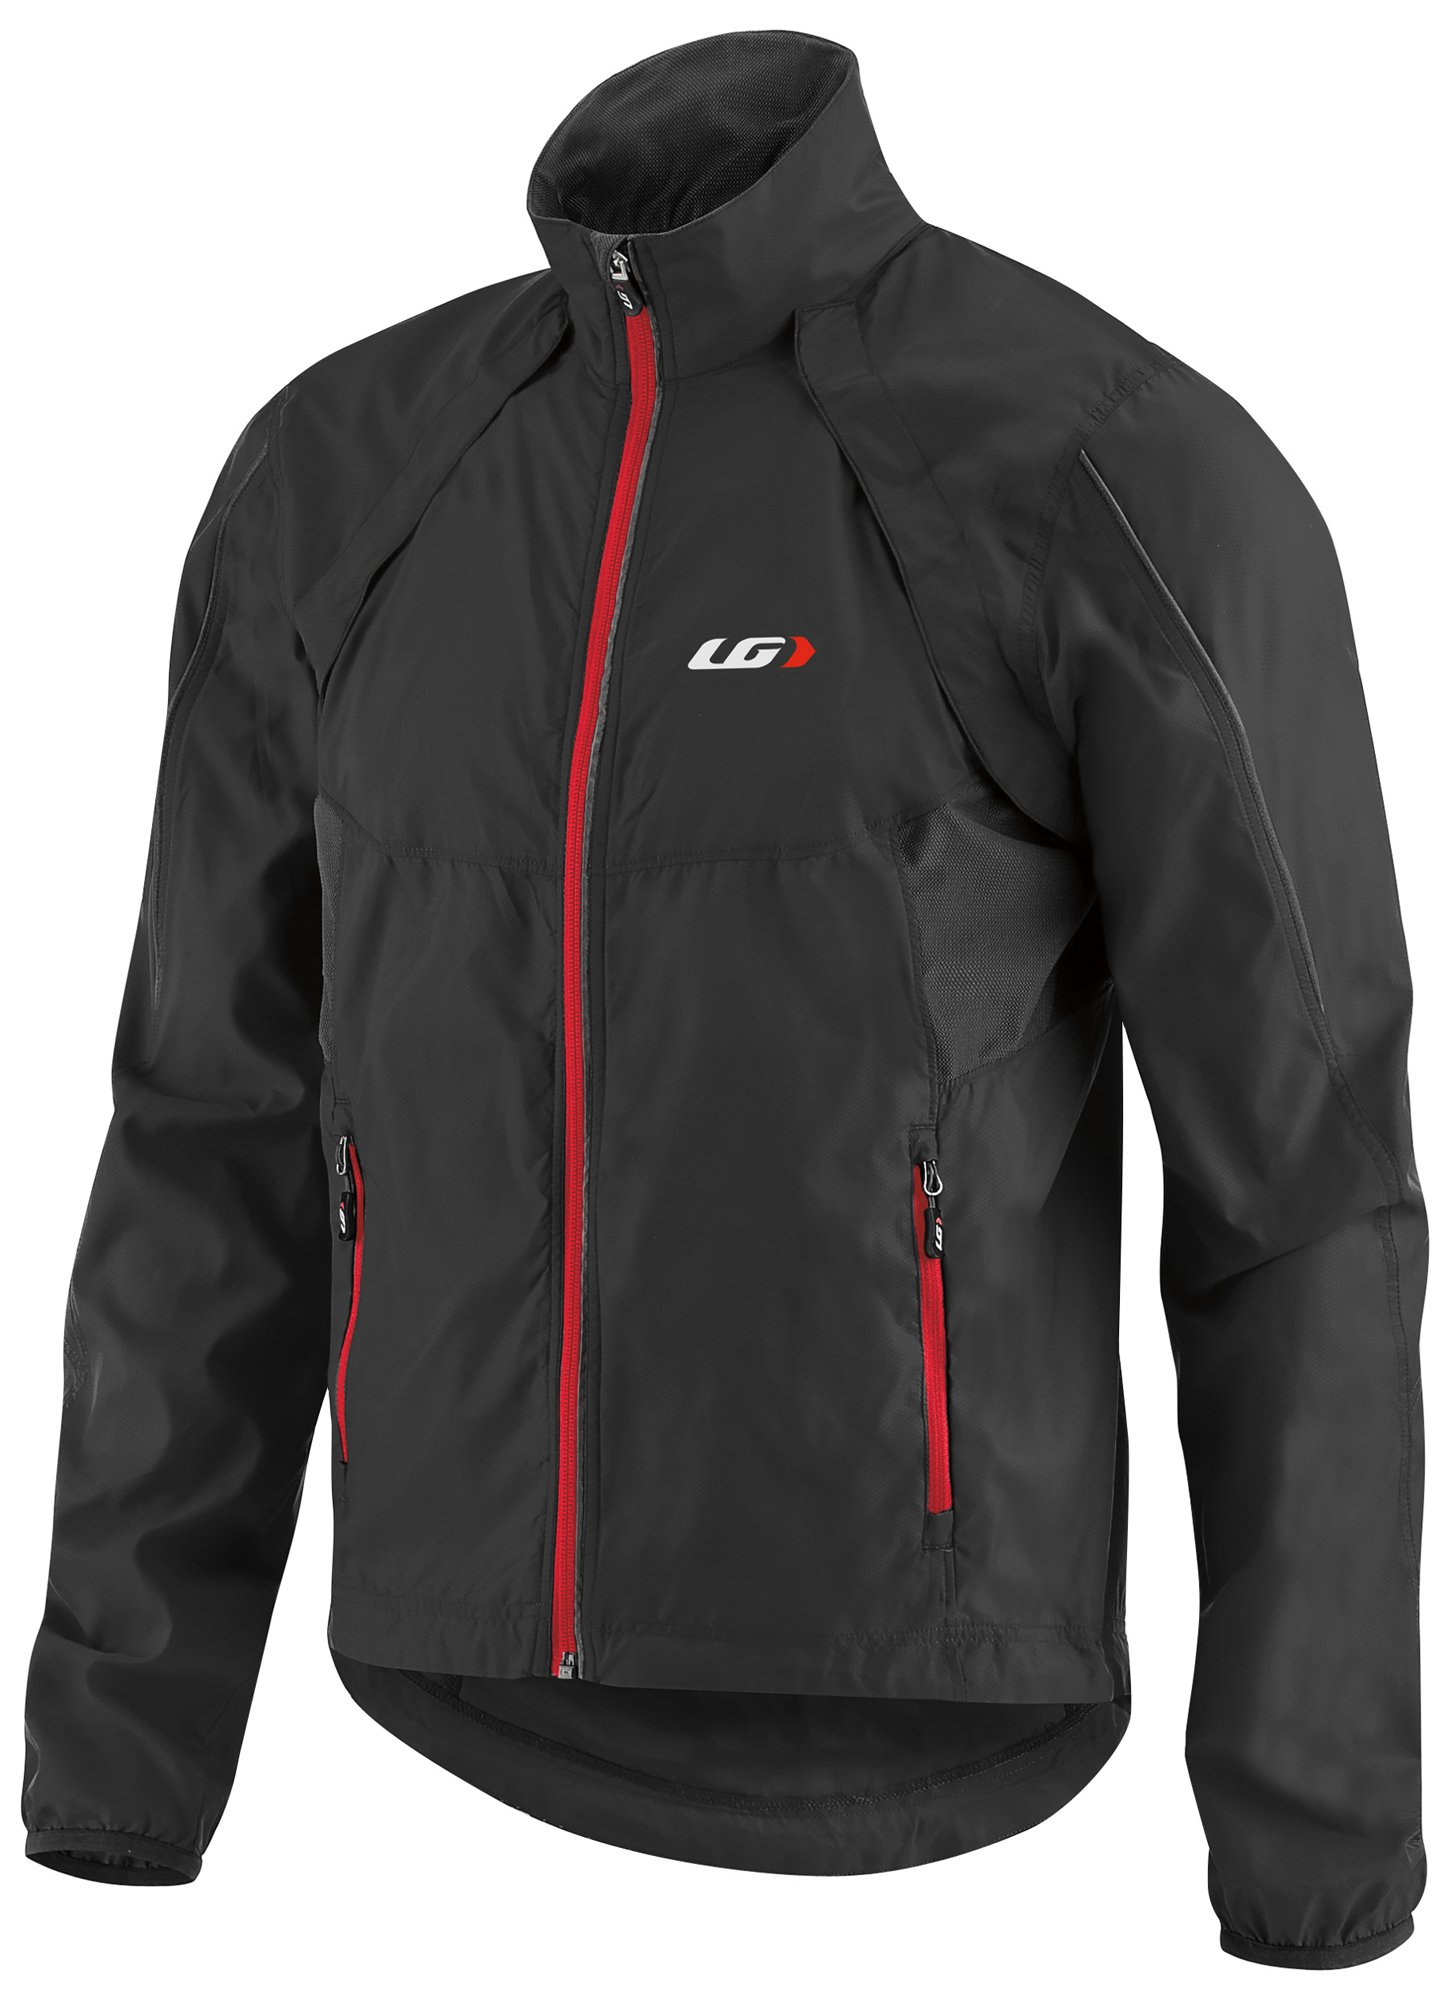 Louis Garneau Cabriolet Bike Jacket, Black/Red, X-Large by Louis Garneau